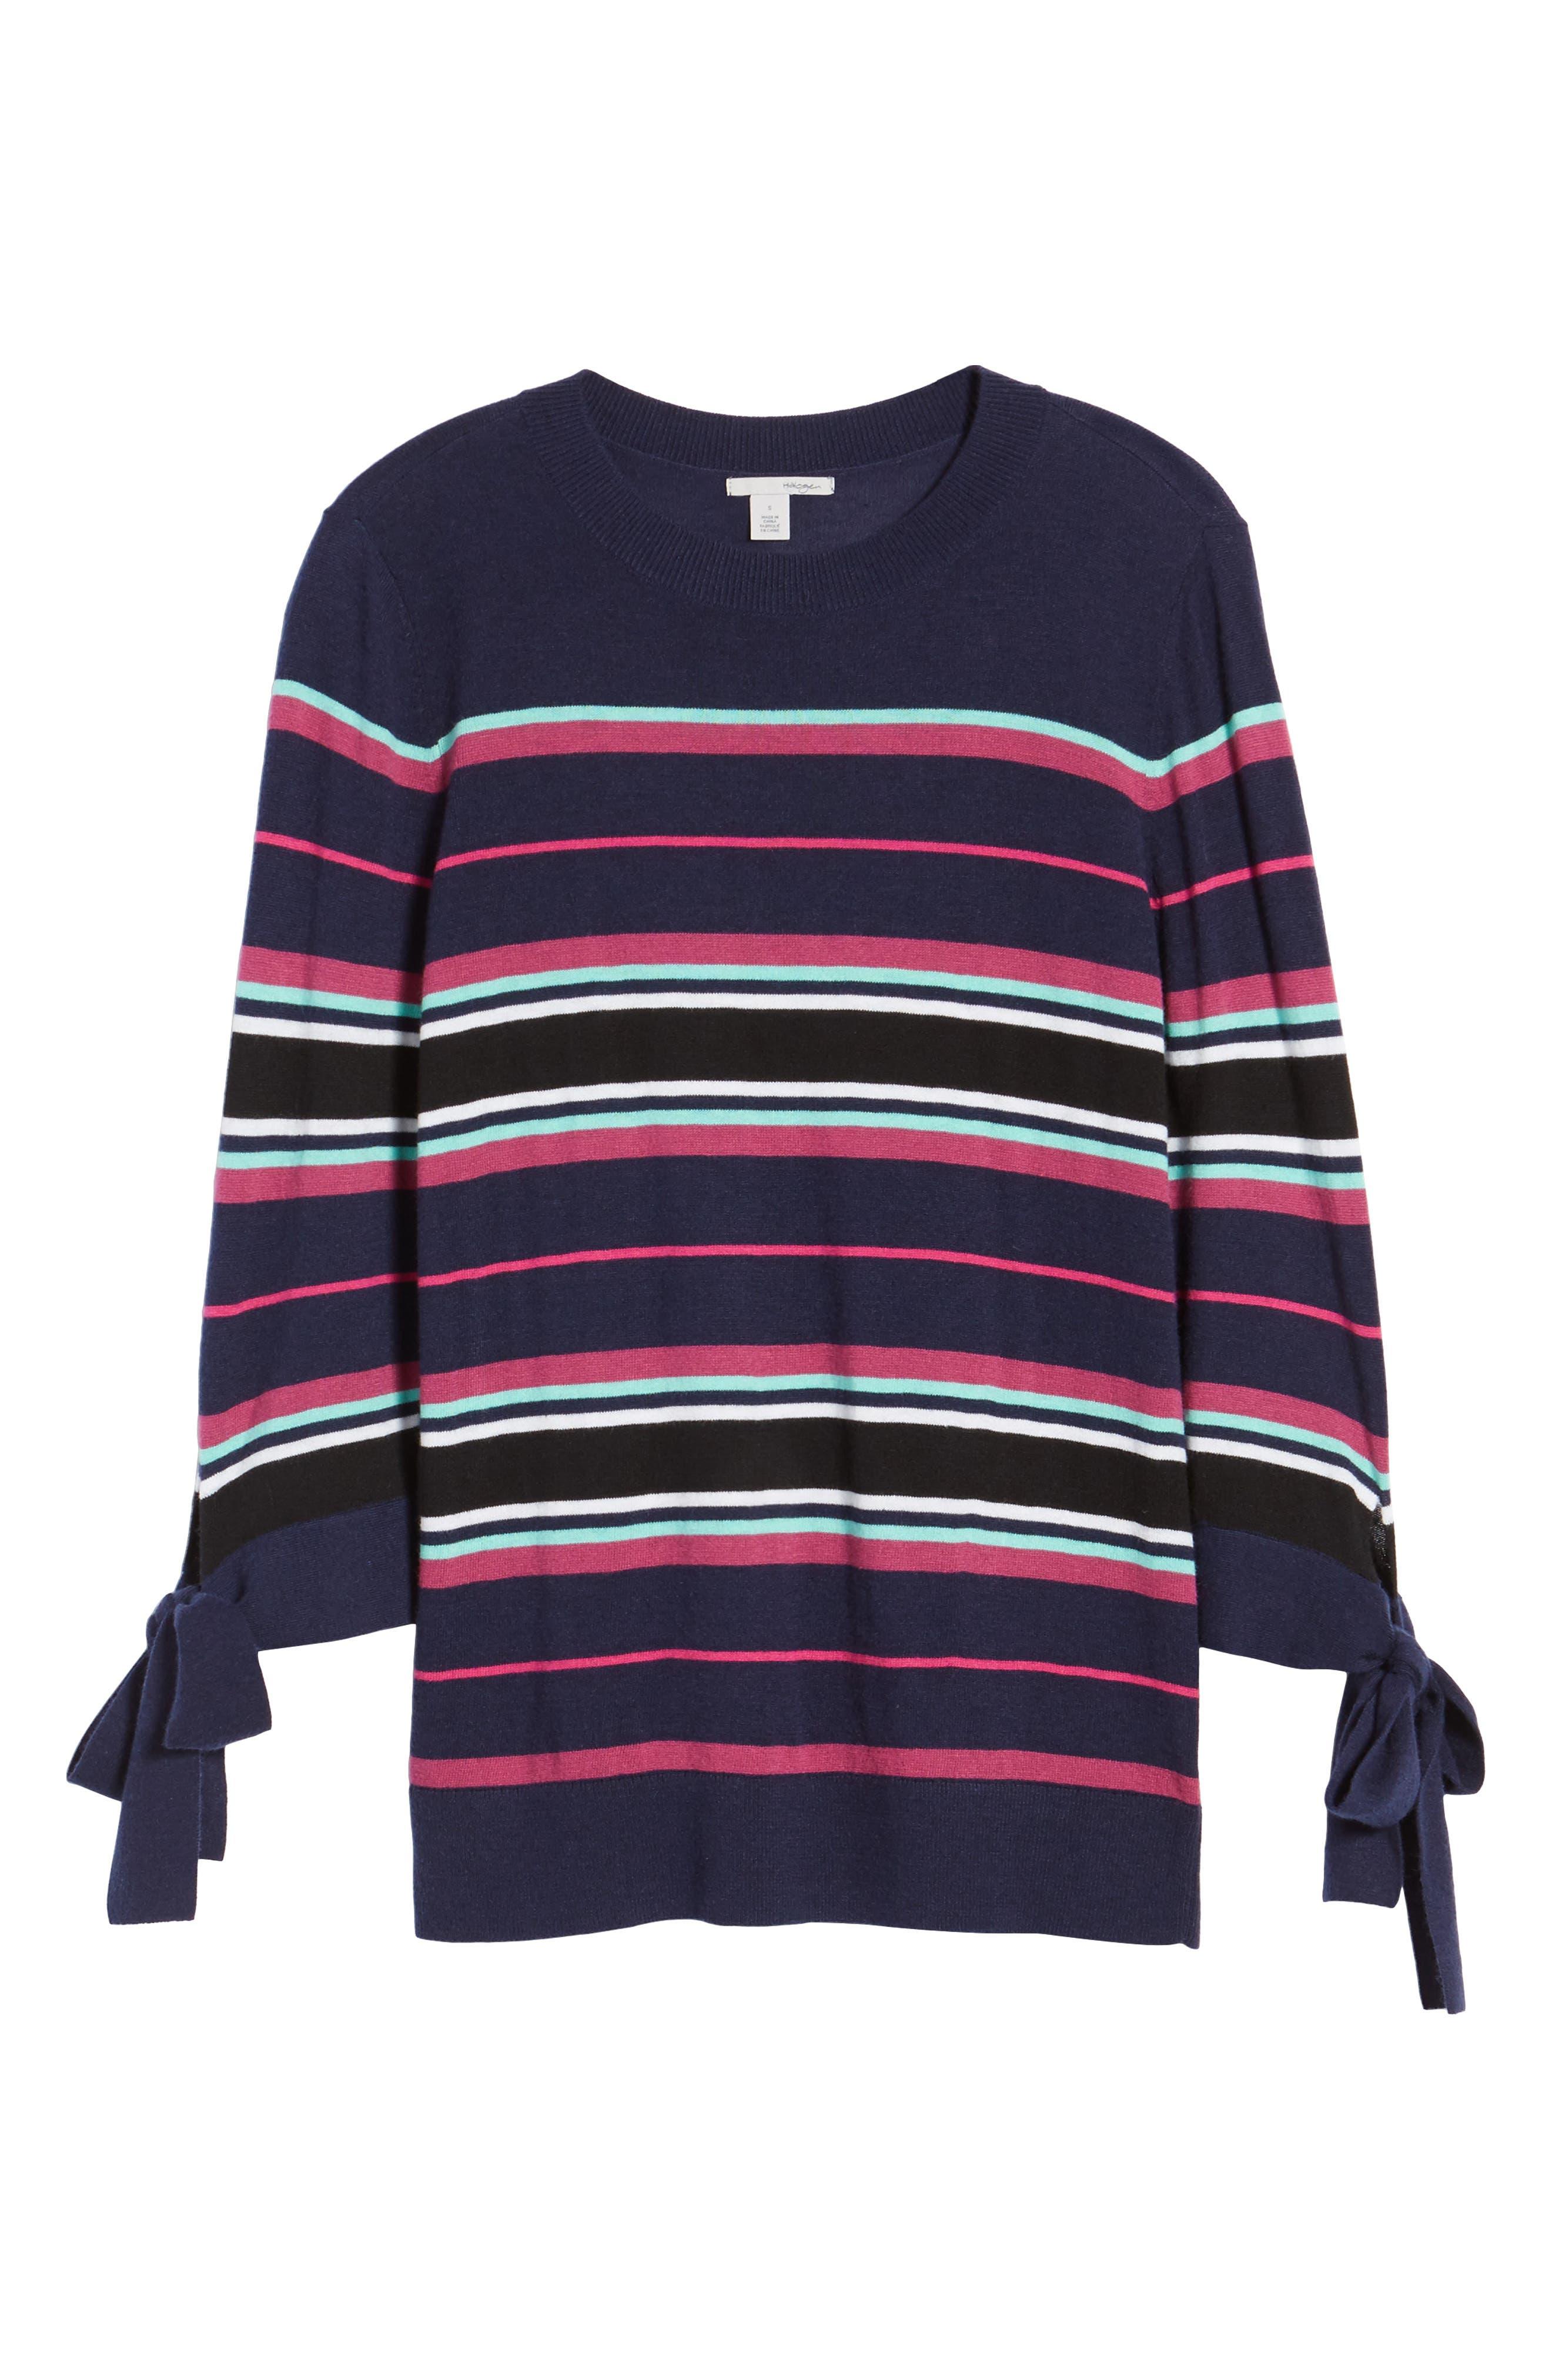 Tie Sleeve Crewneck Sweater,                             Alternate thumbnail 6, color,                             Navy/ Pink Multi Stripe